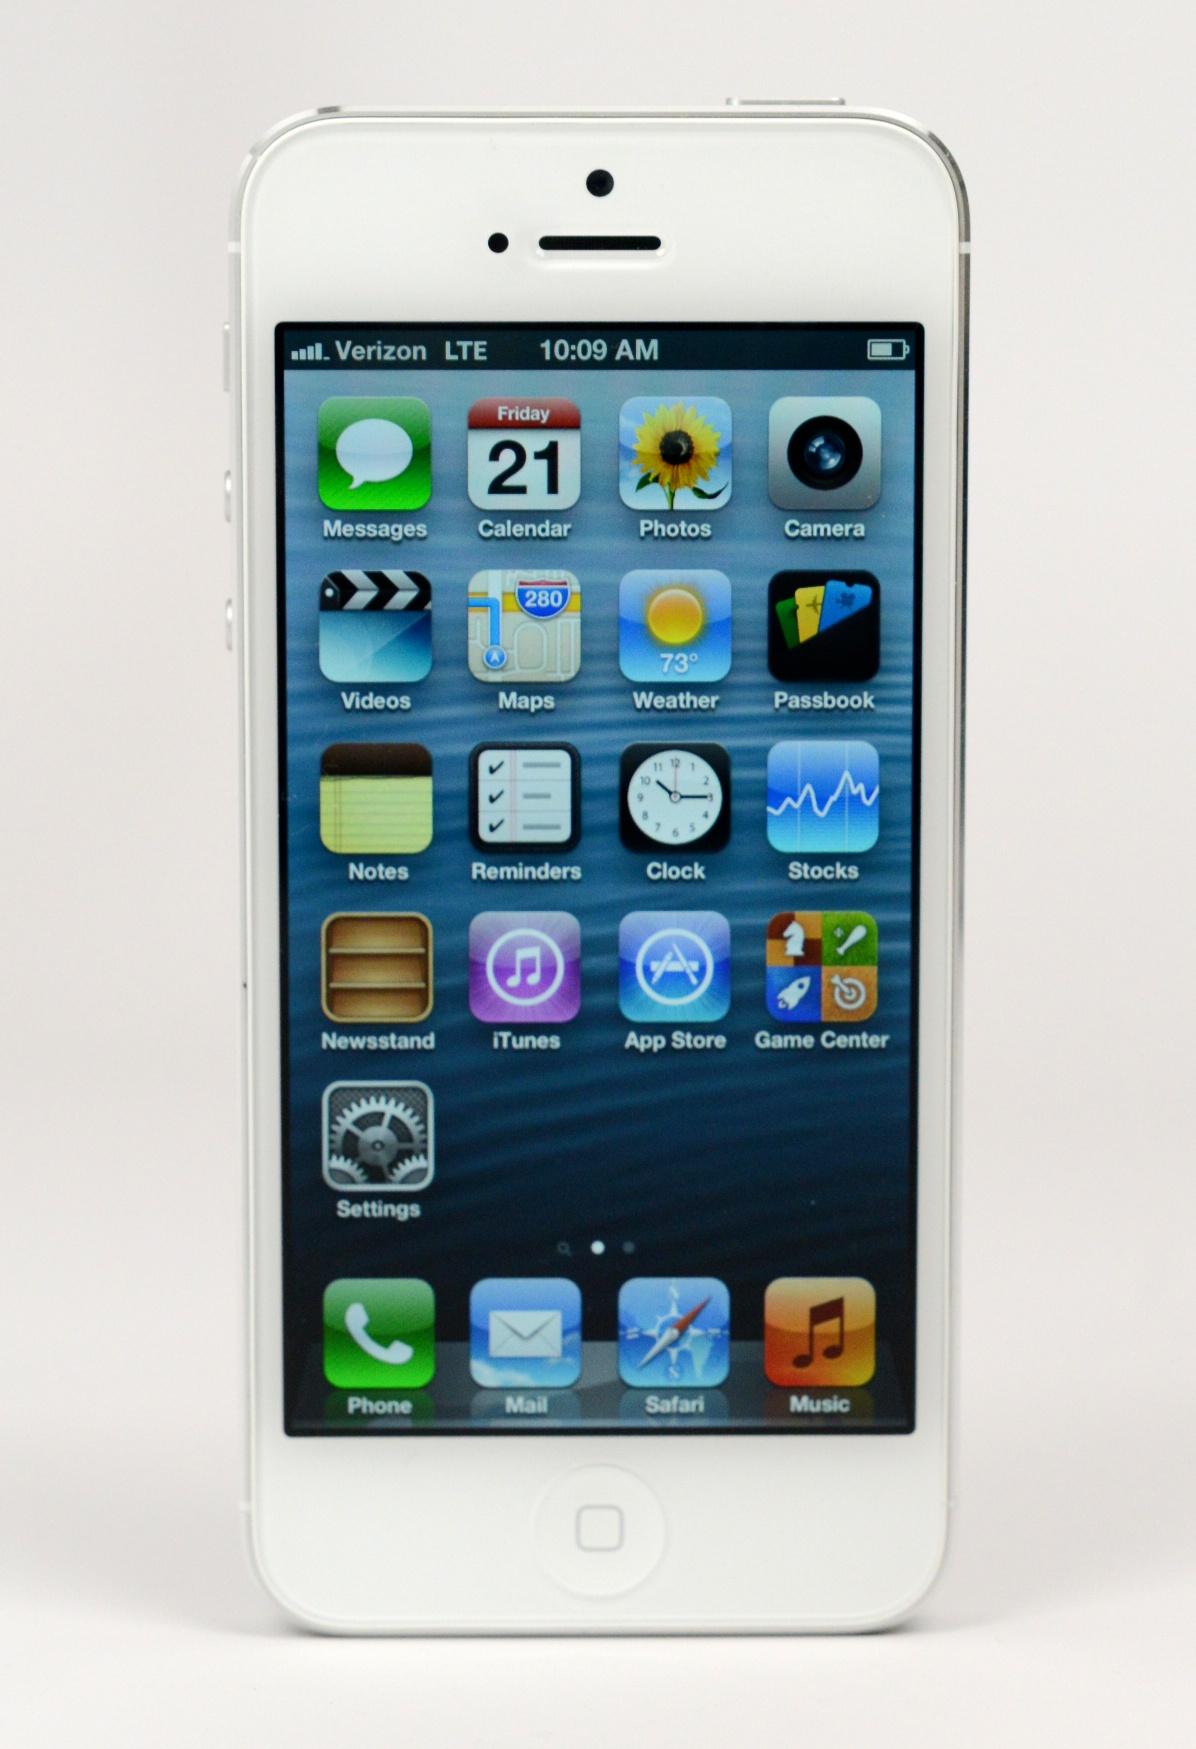 at t vs verizon 4g lte iphone 5 picks up serious speed. Black Bedroom Furniture Sets. Home Design Ideas